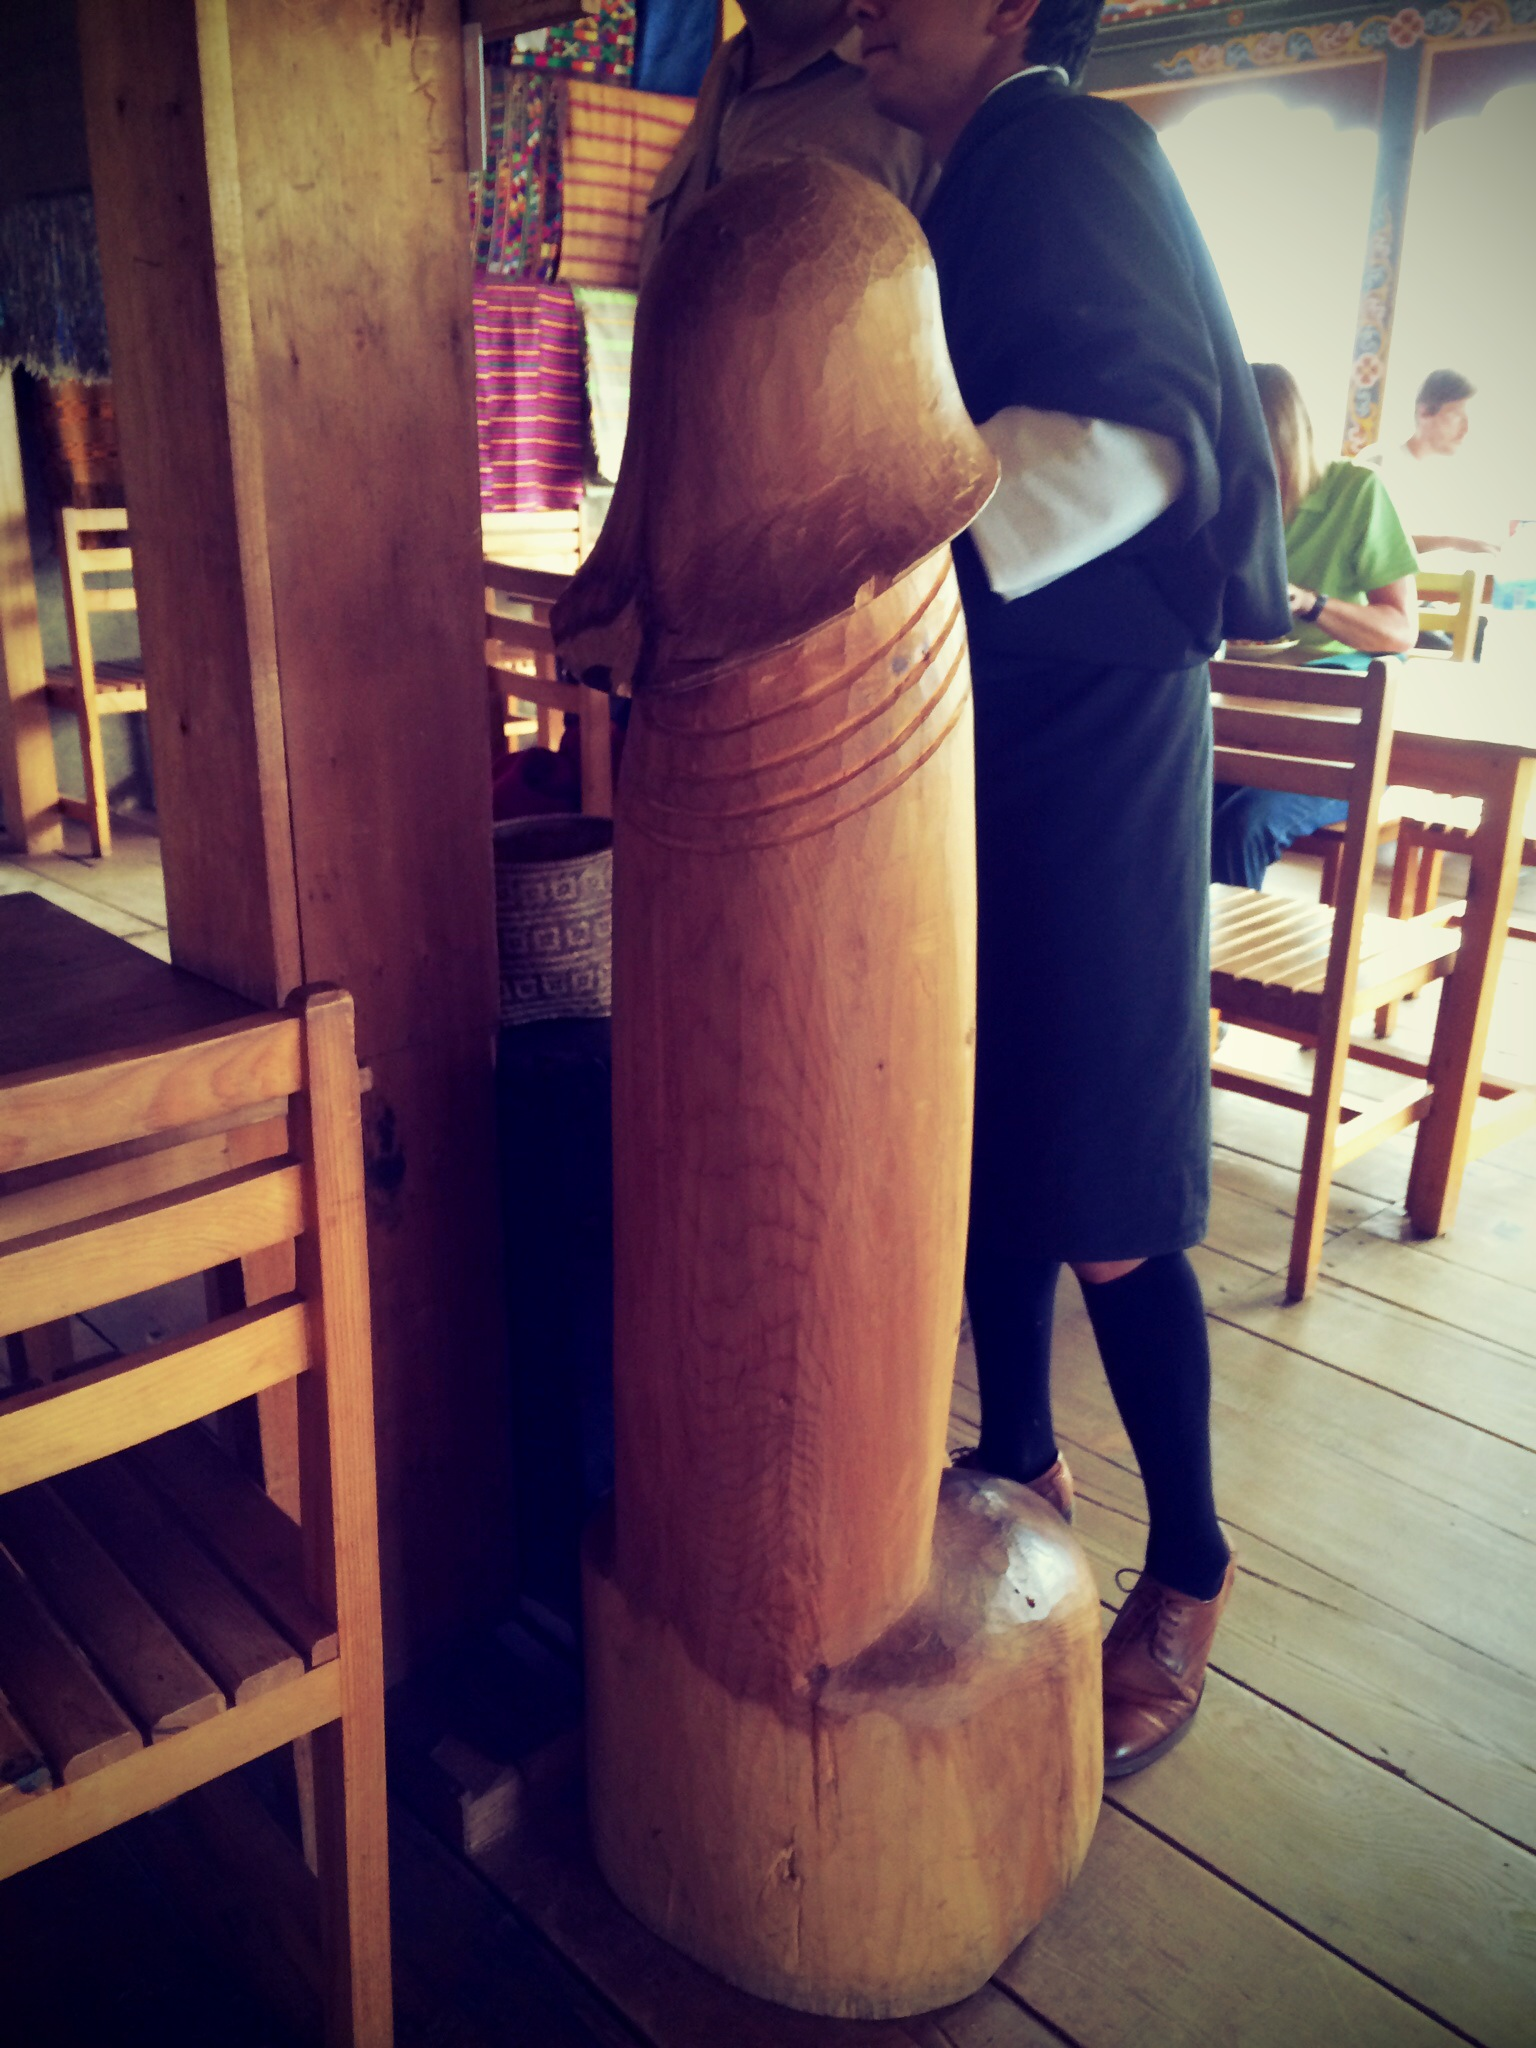 Large penis statue in restaurant in Bhutan